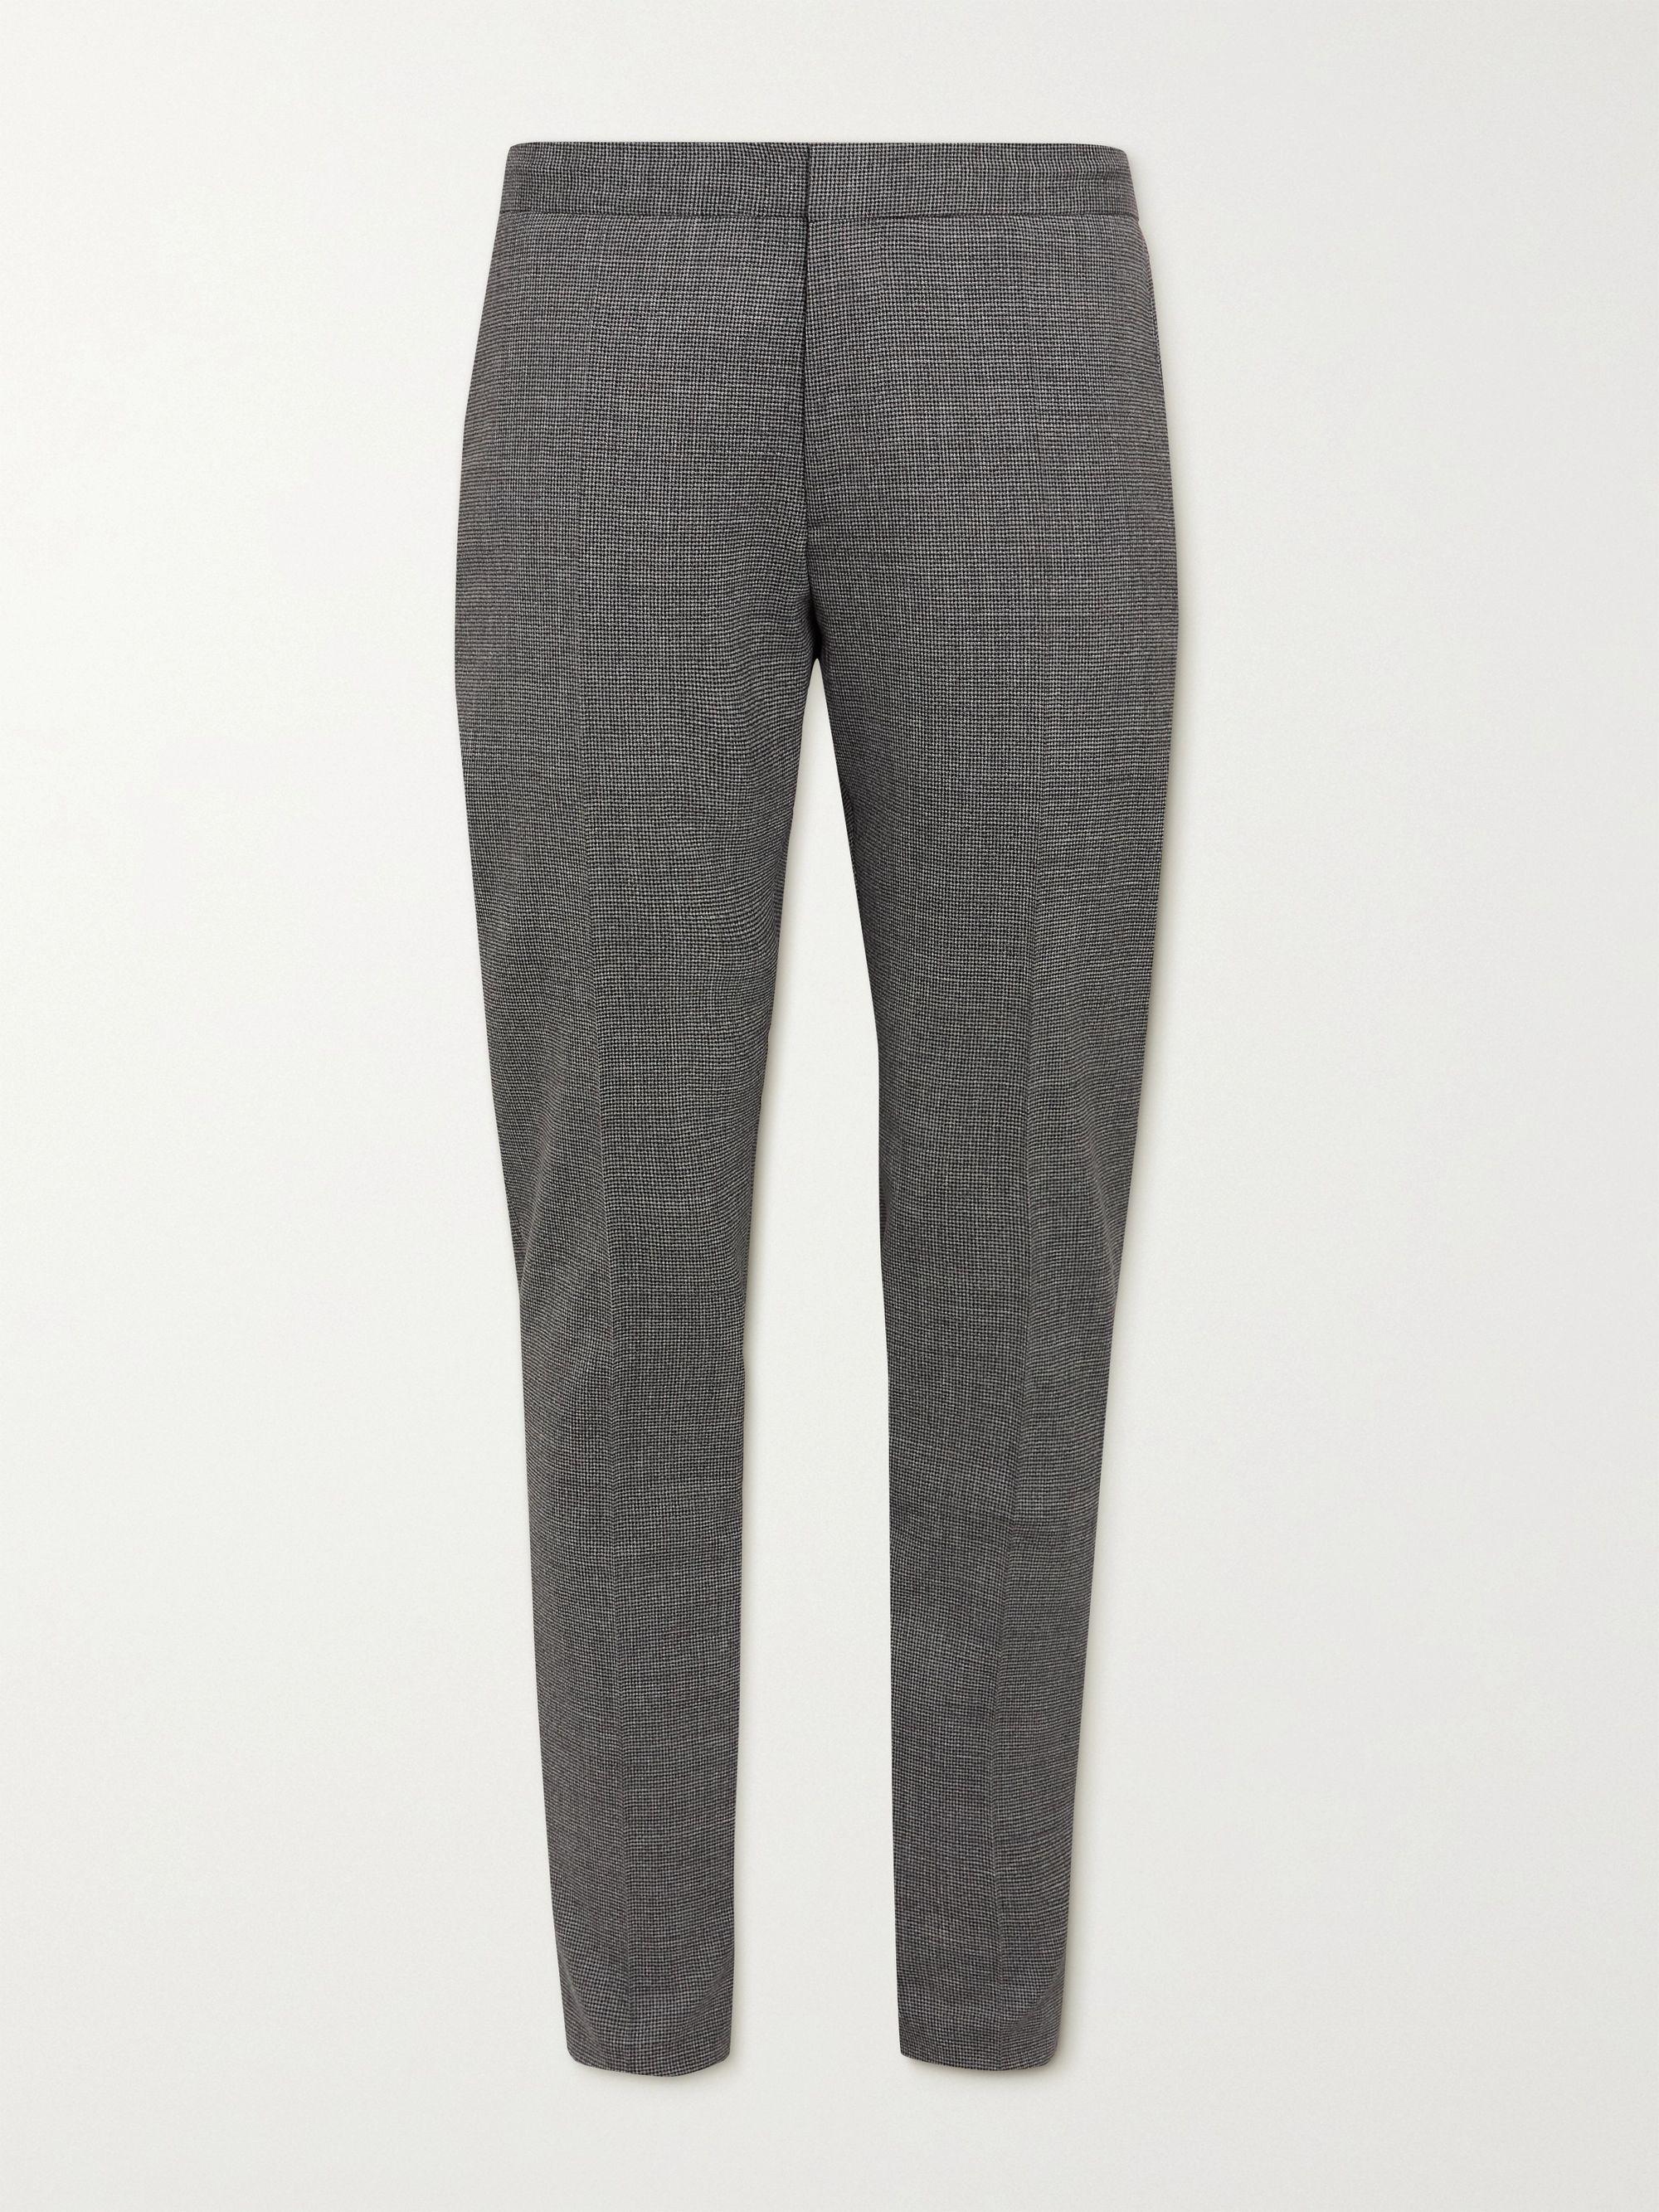 HUGO BOSS Slim-Fit Puppytooth Stretch Virgin Wool Trousers